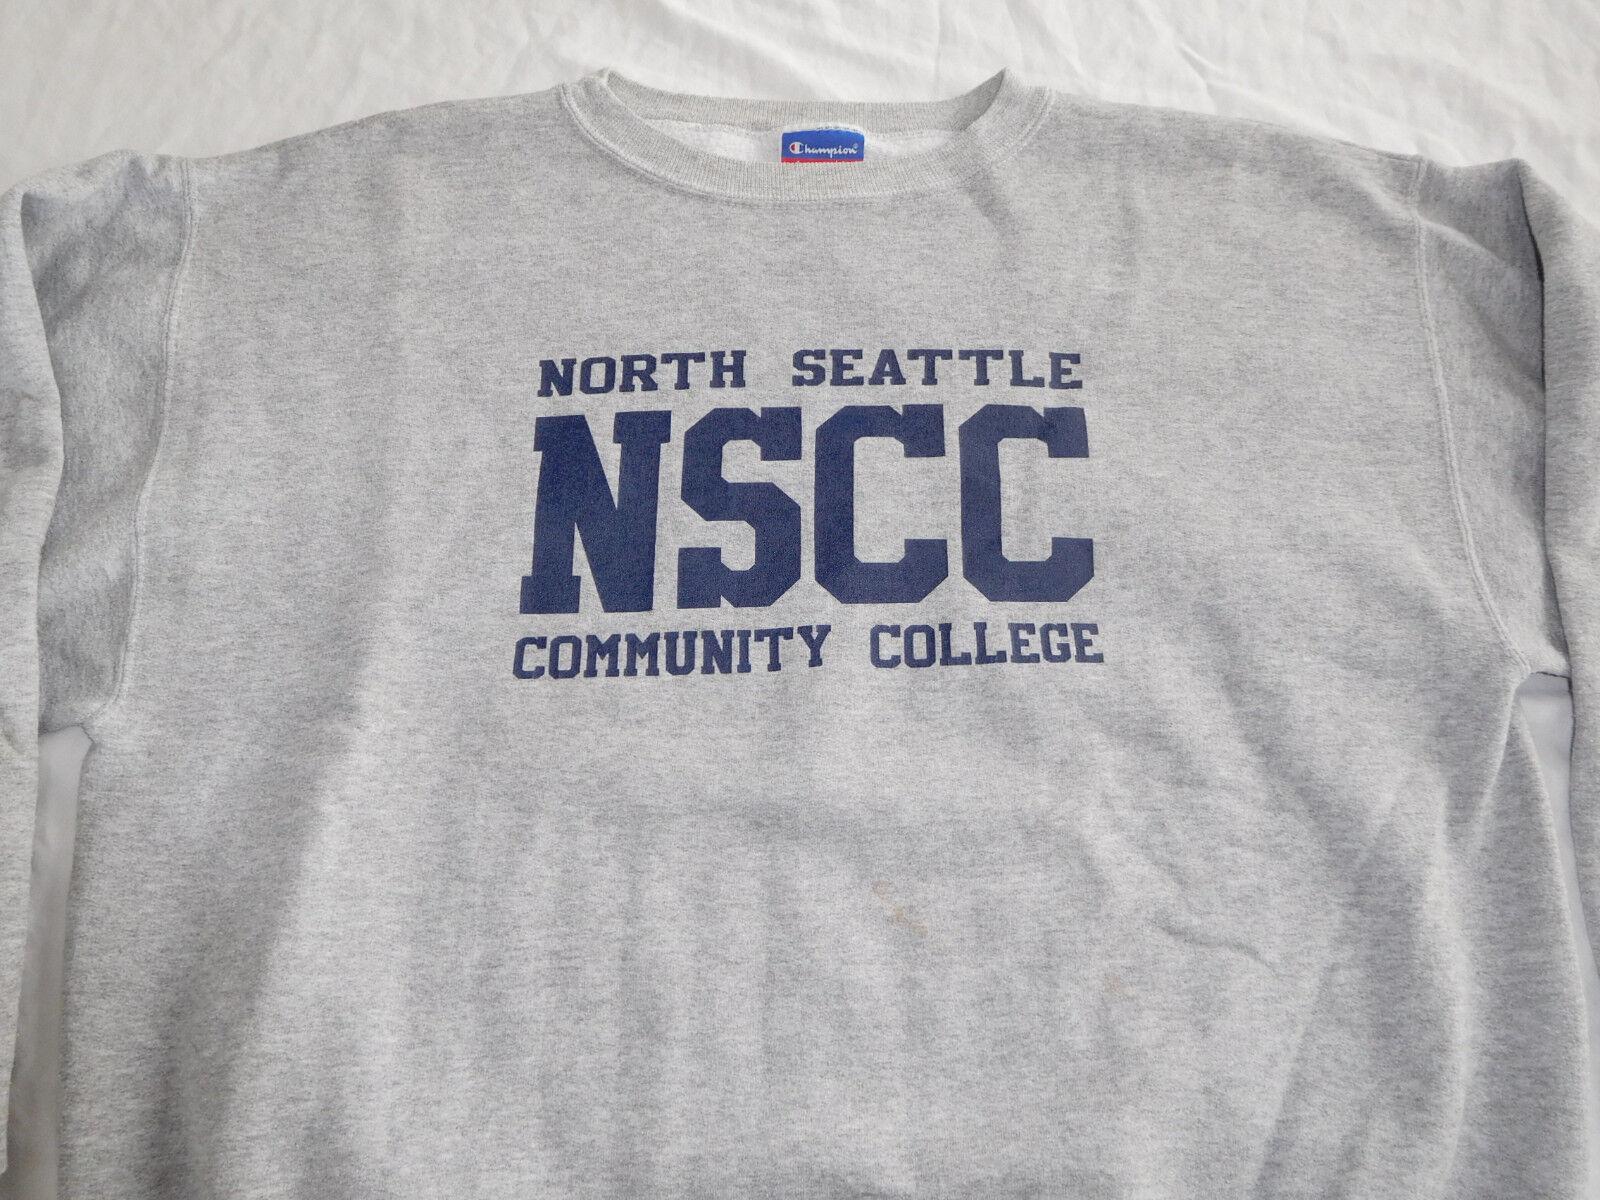 North Seattle Community College NSCC Sweatshirt Shirt L Large Champion